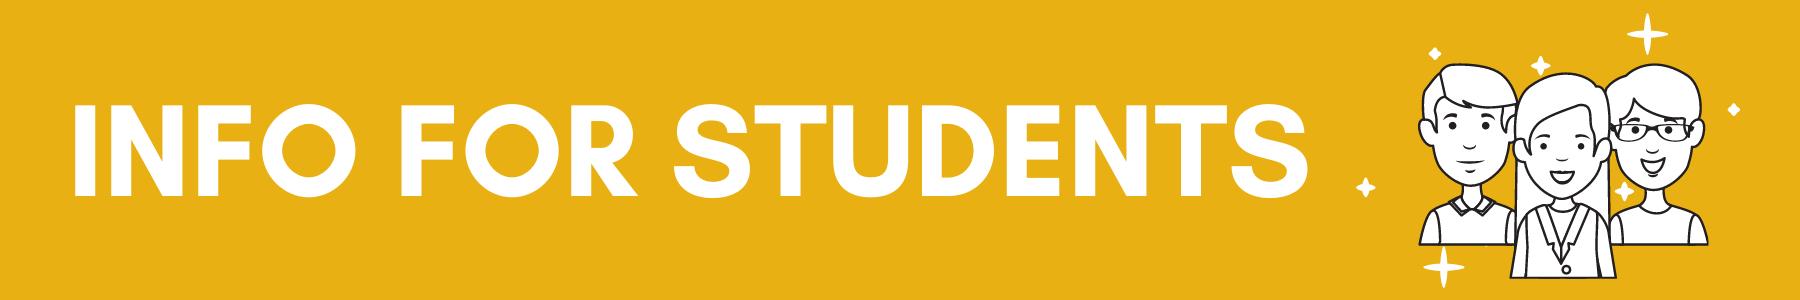 oer information for students banner